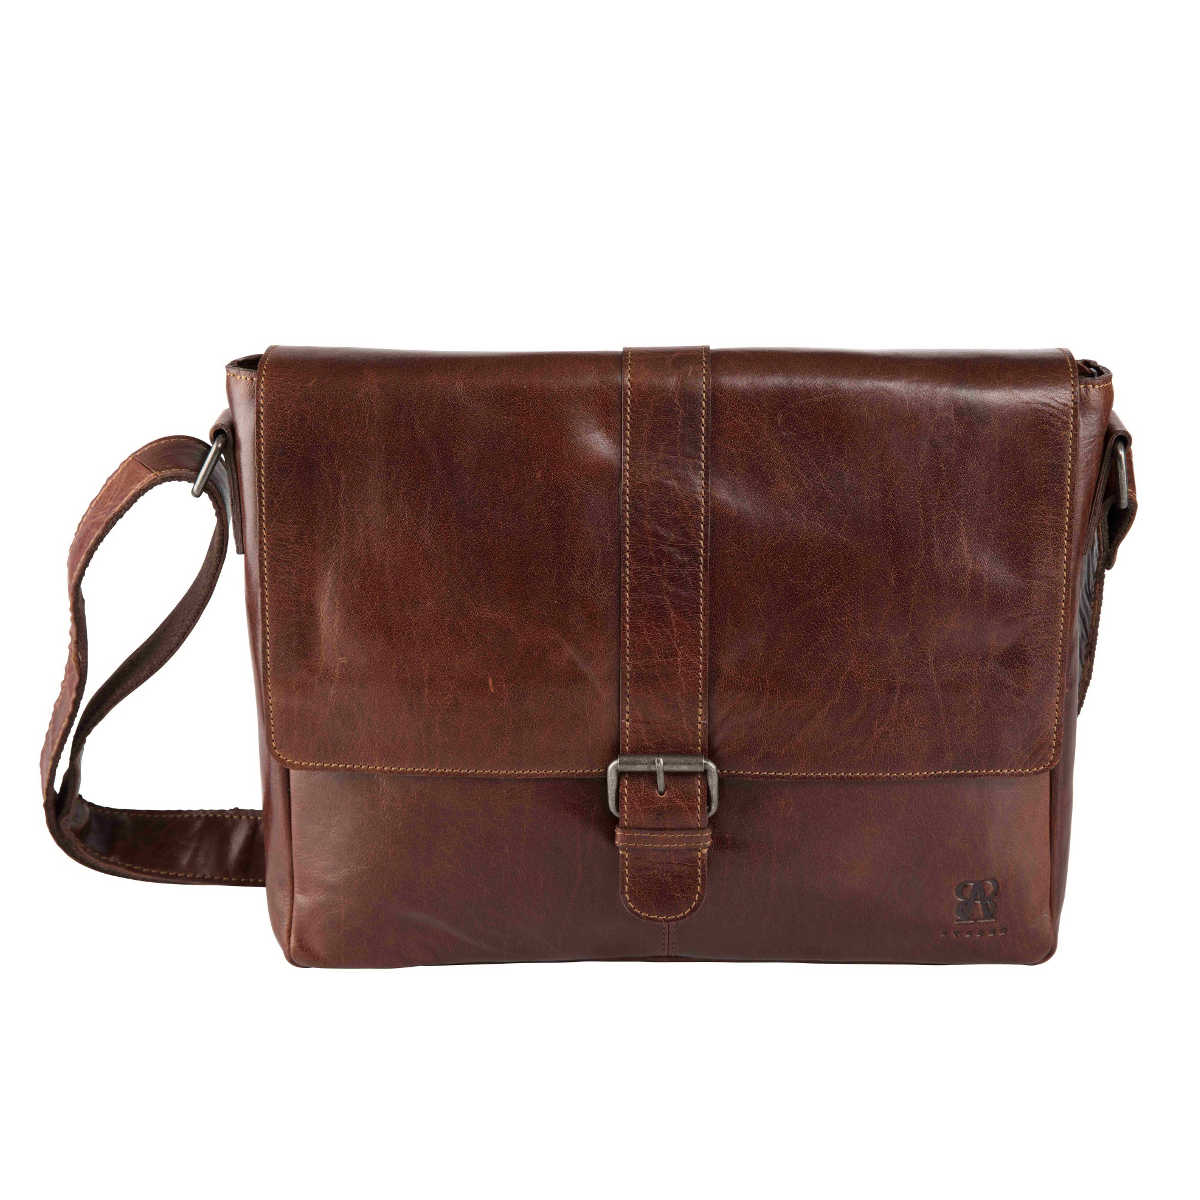 läder messenger väska